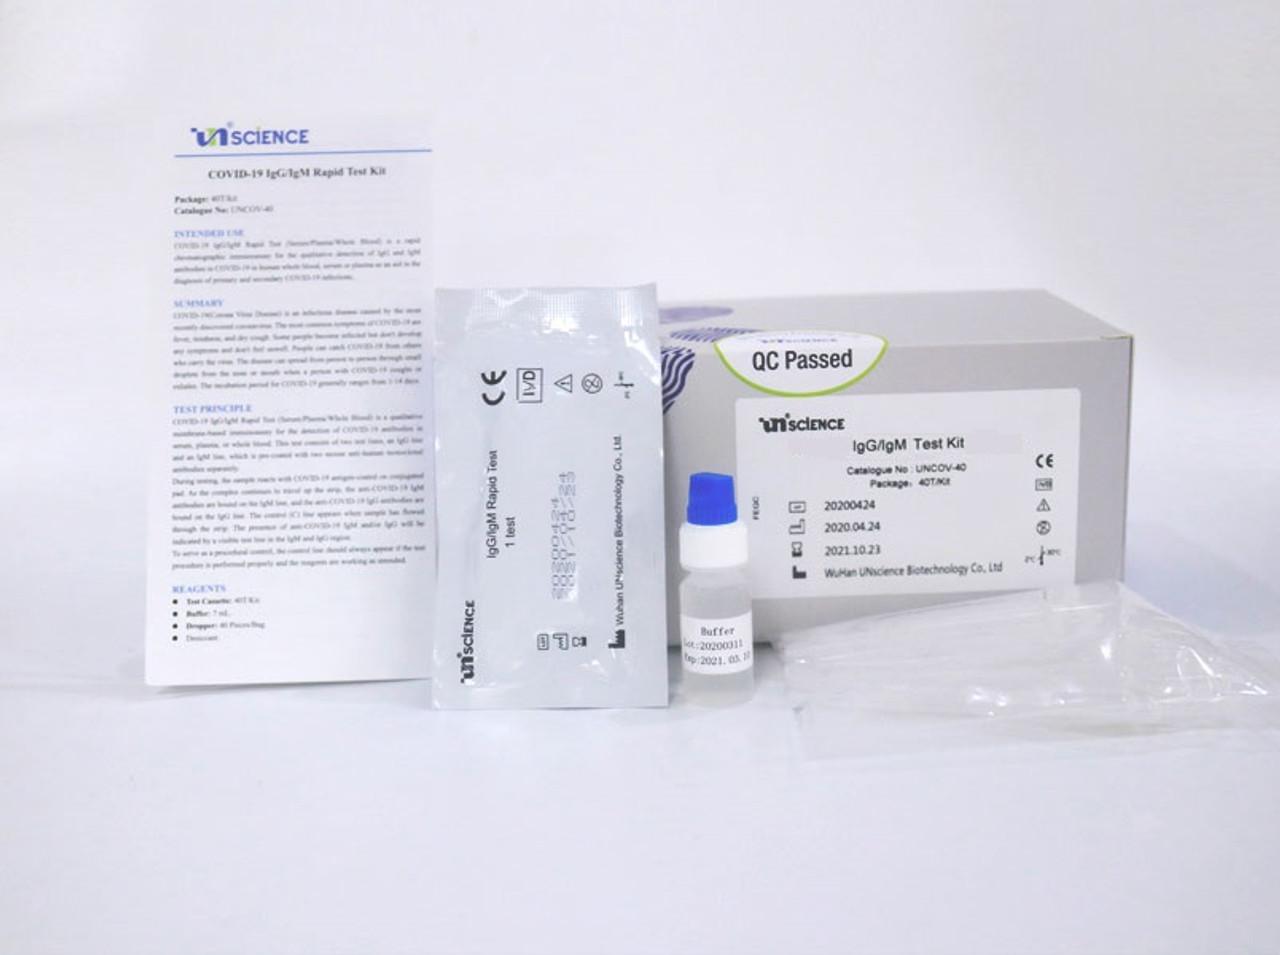 elabscience-igg-igm-test